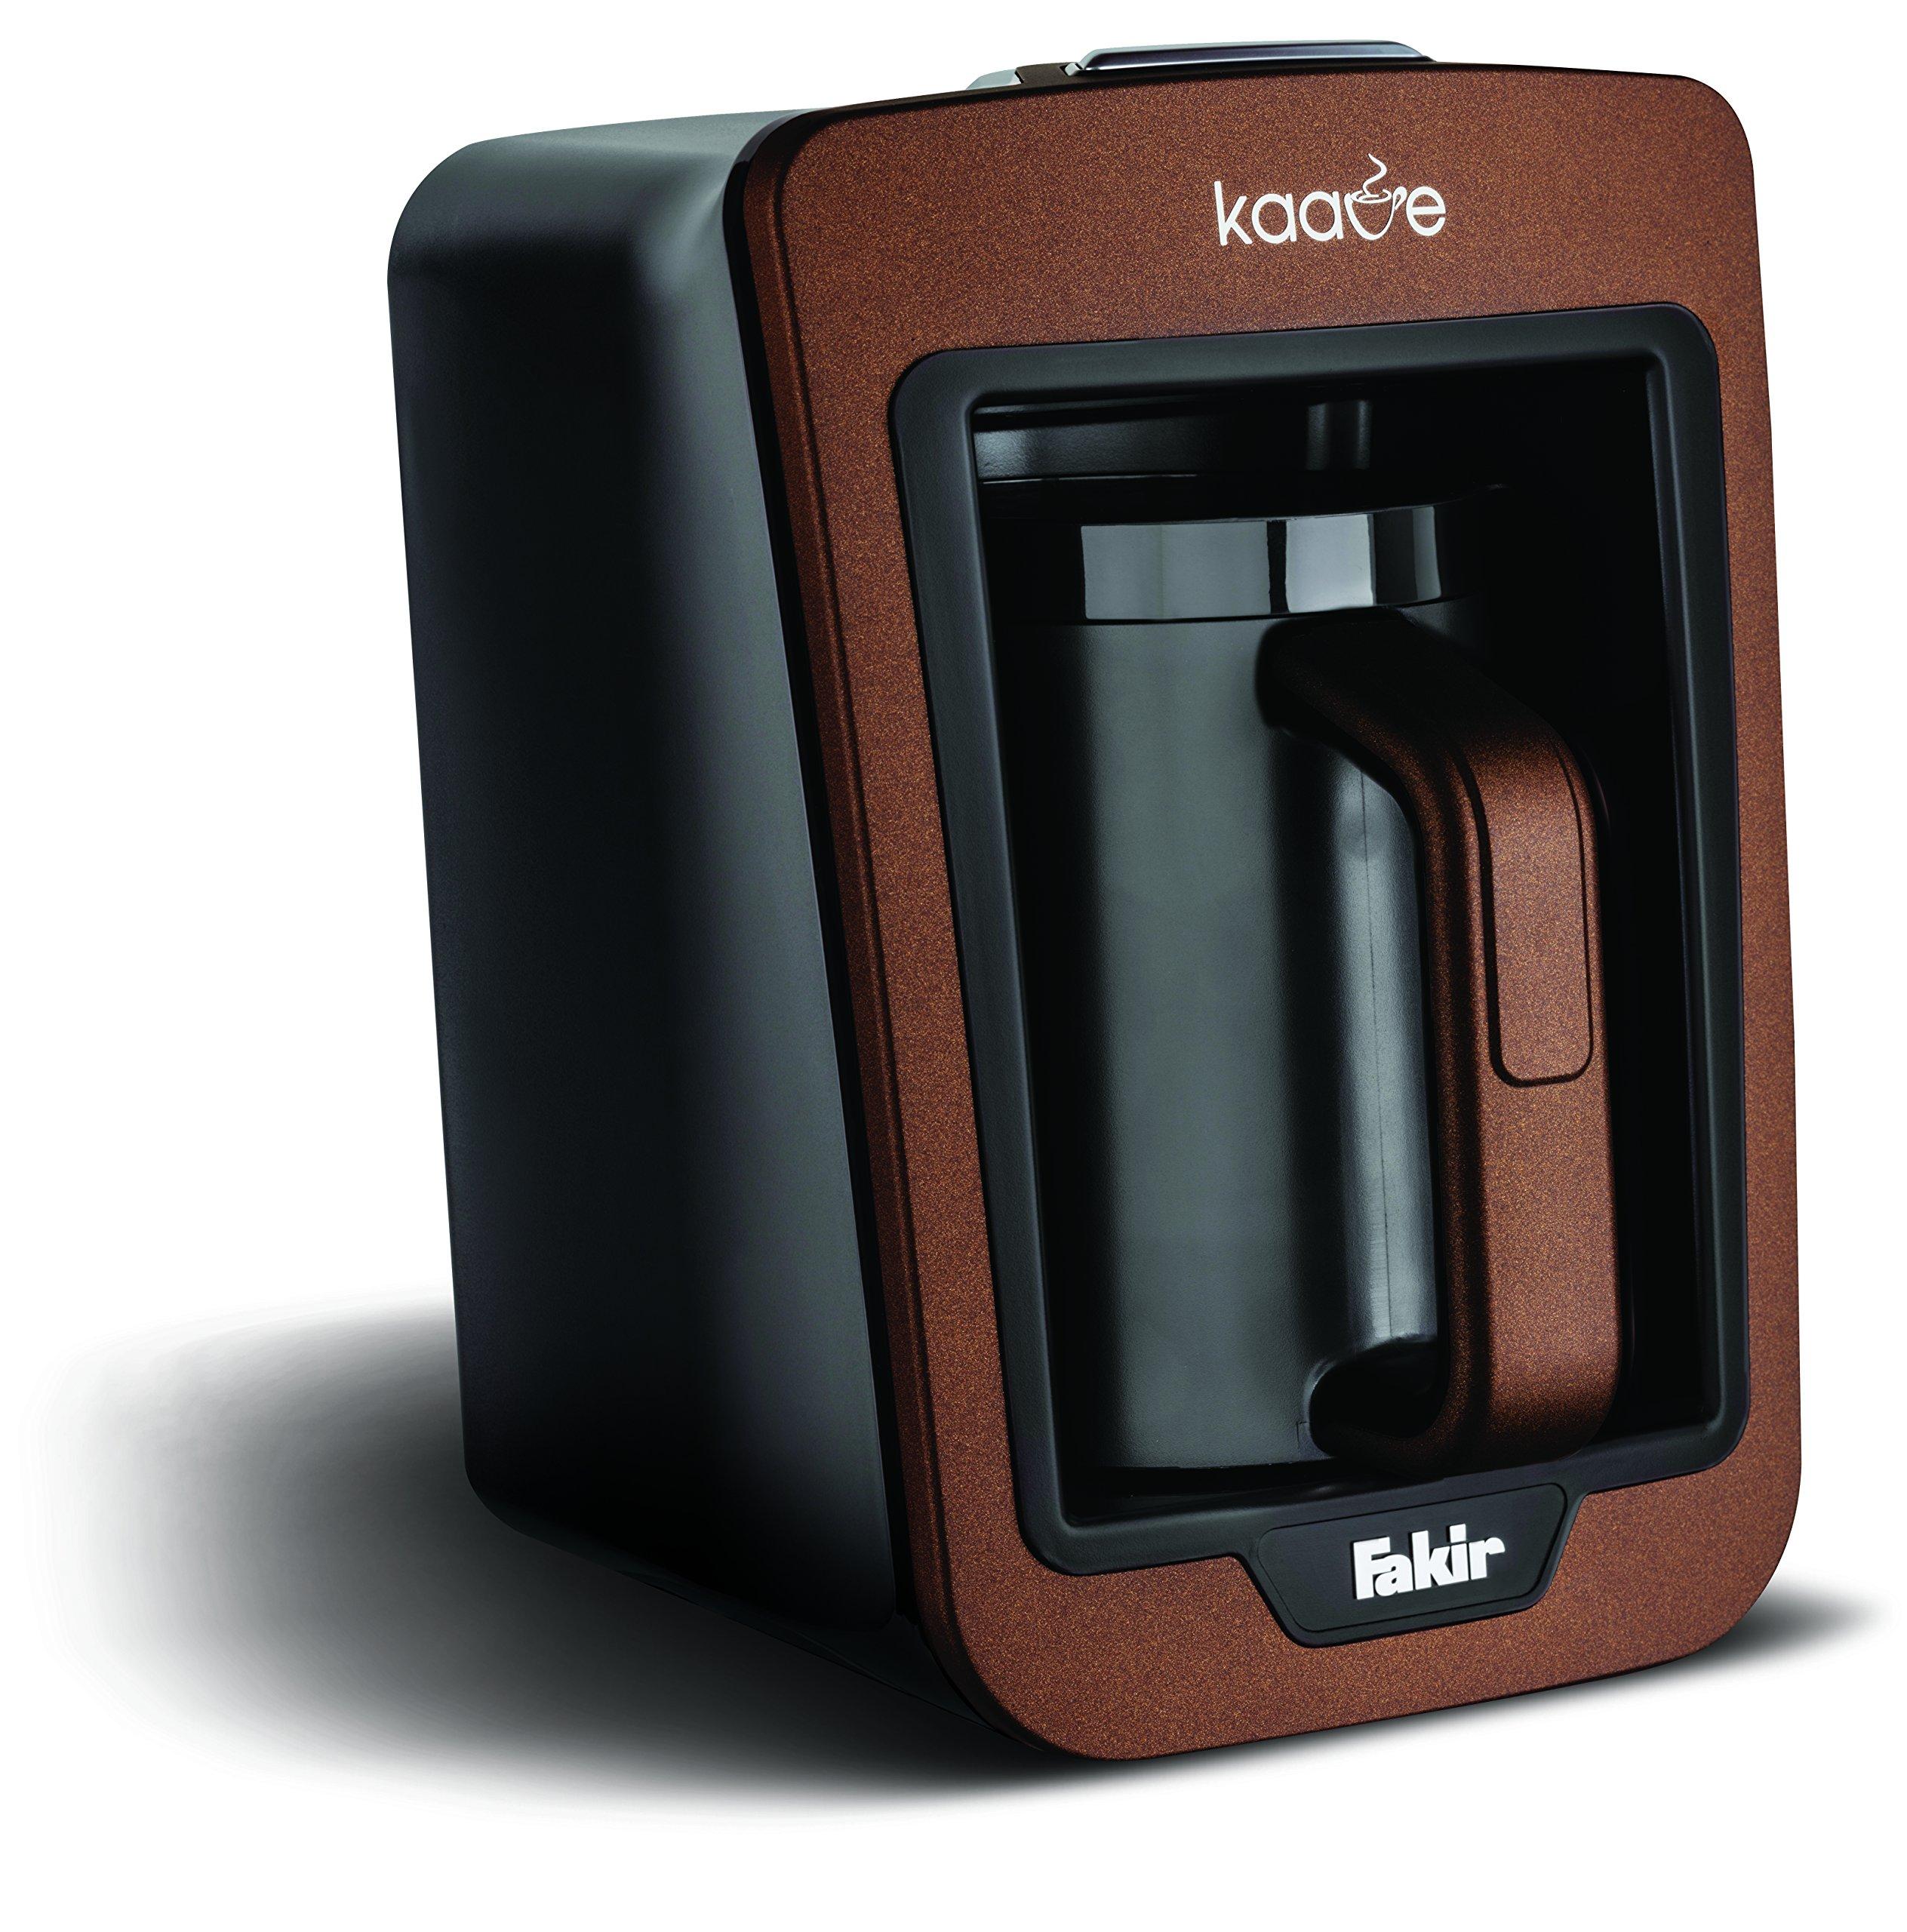 Fakir-Mokkakaffeemaschine-Kaave-735-W